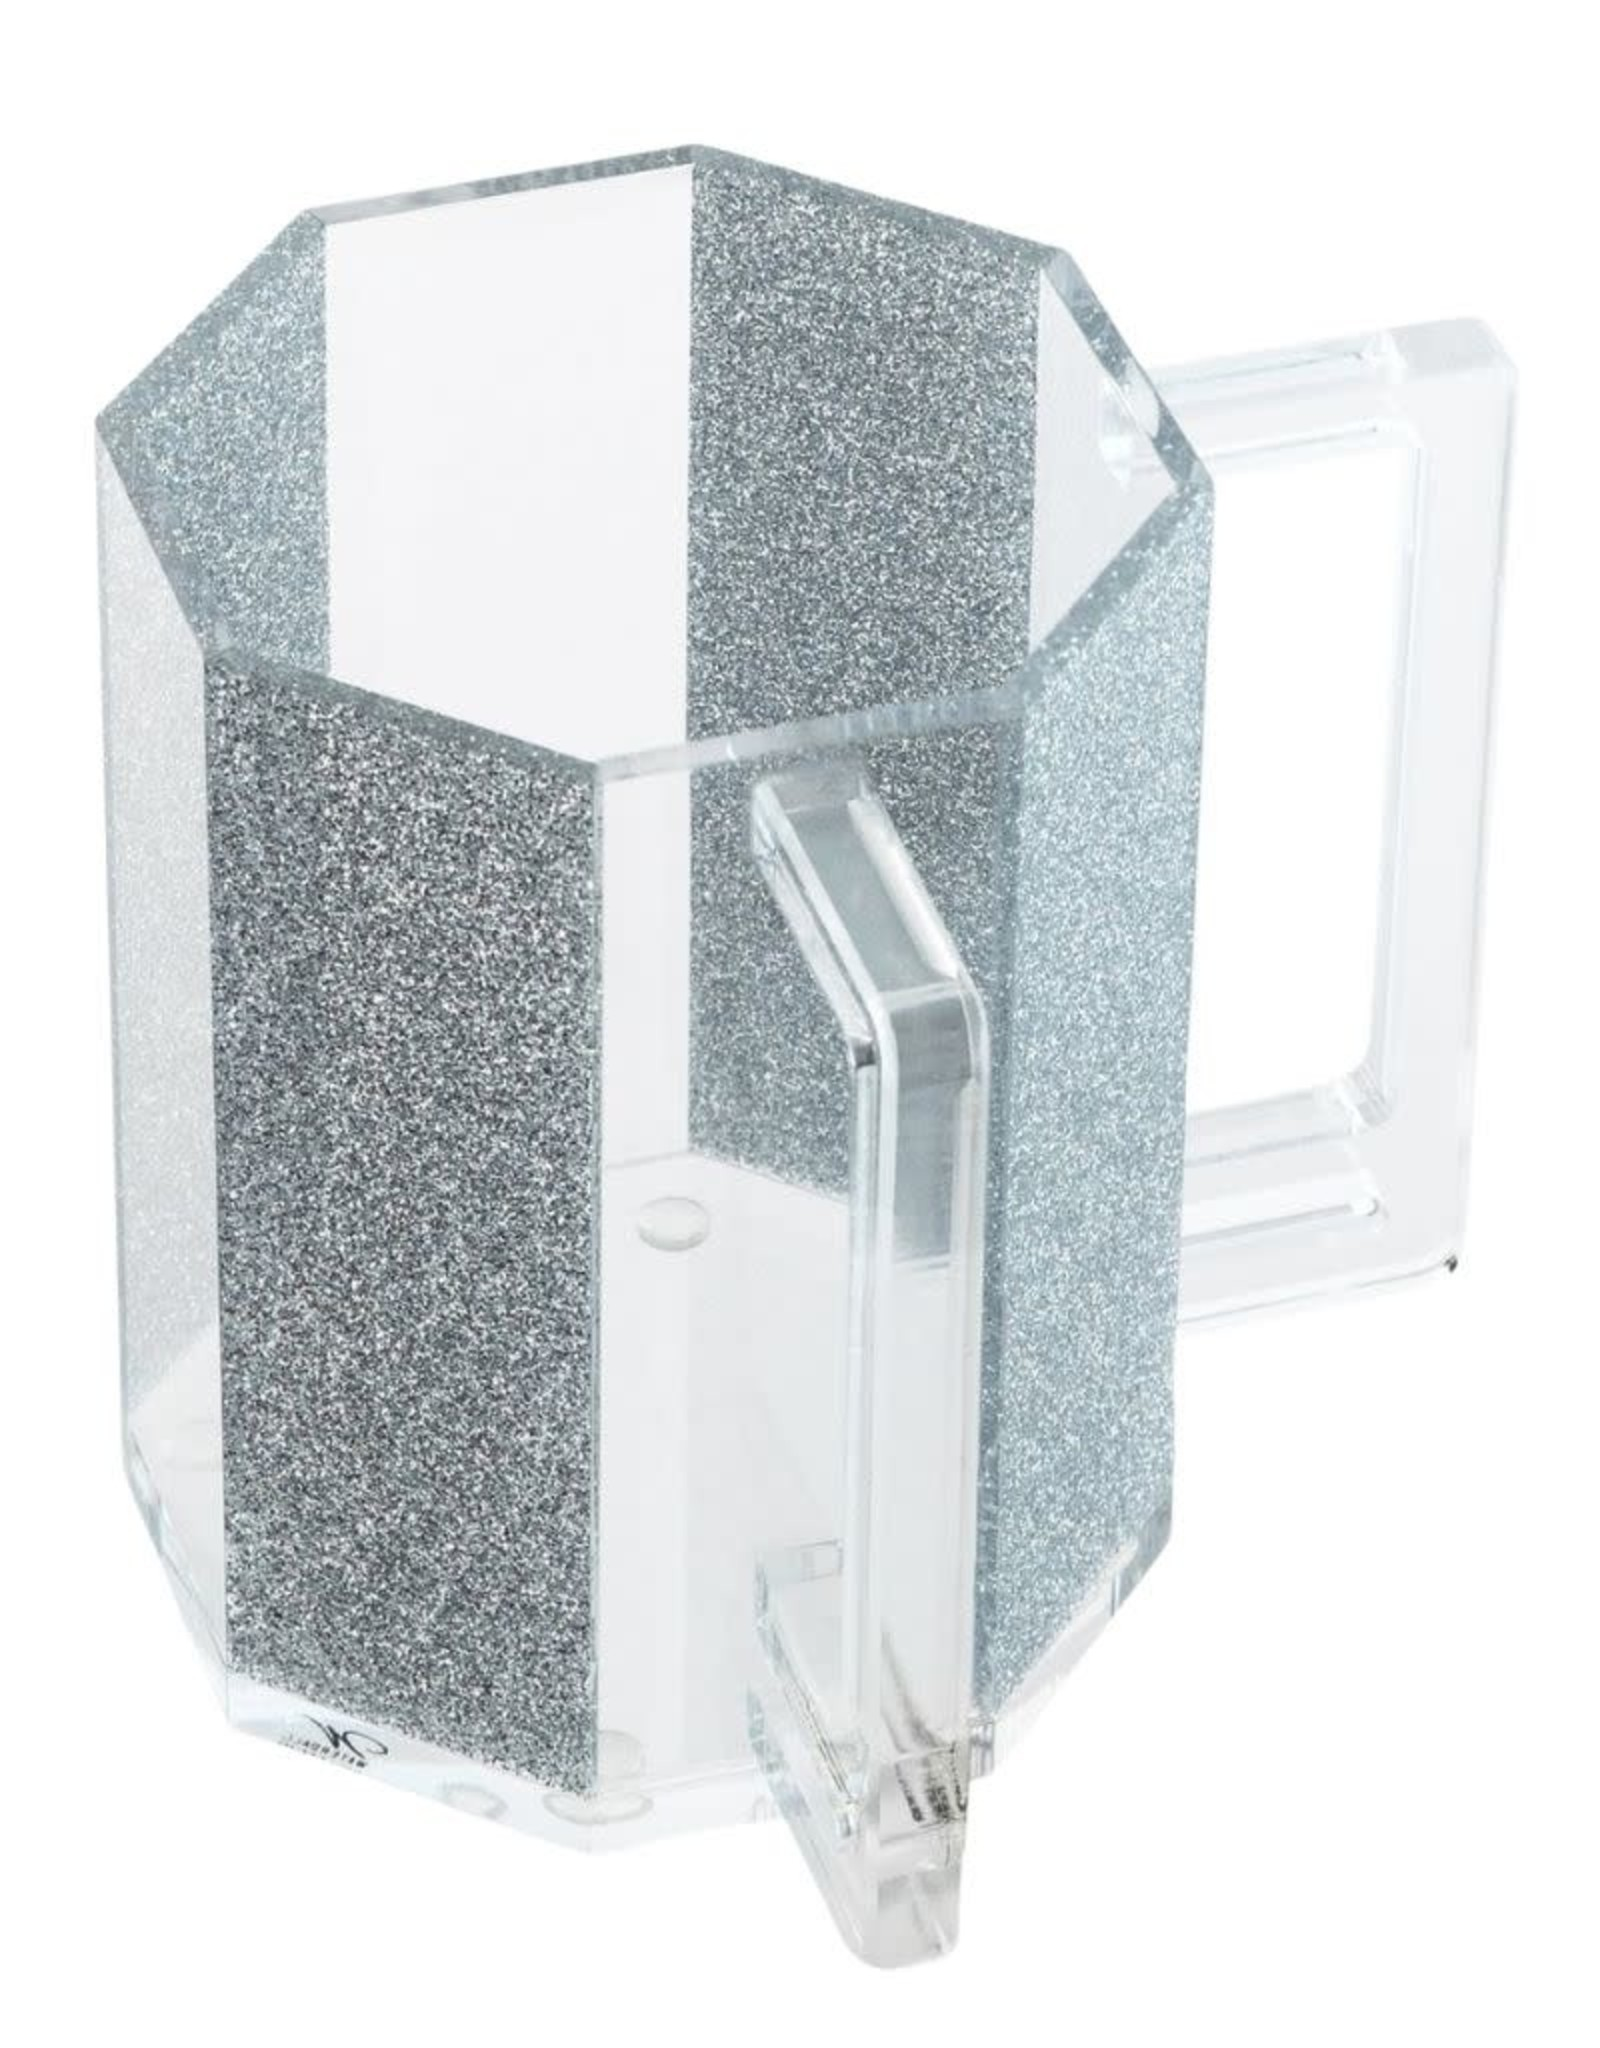 Waterdale Hexagon Washing Cup Silver Glitter